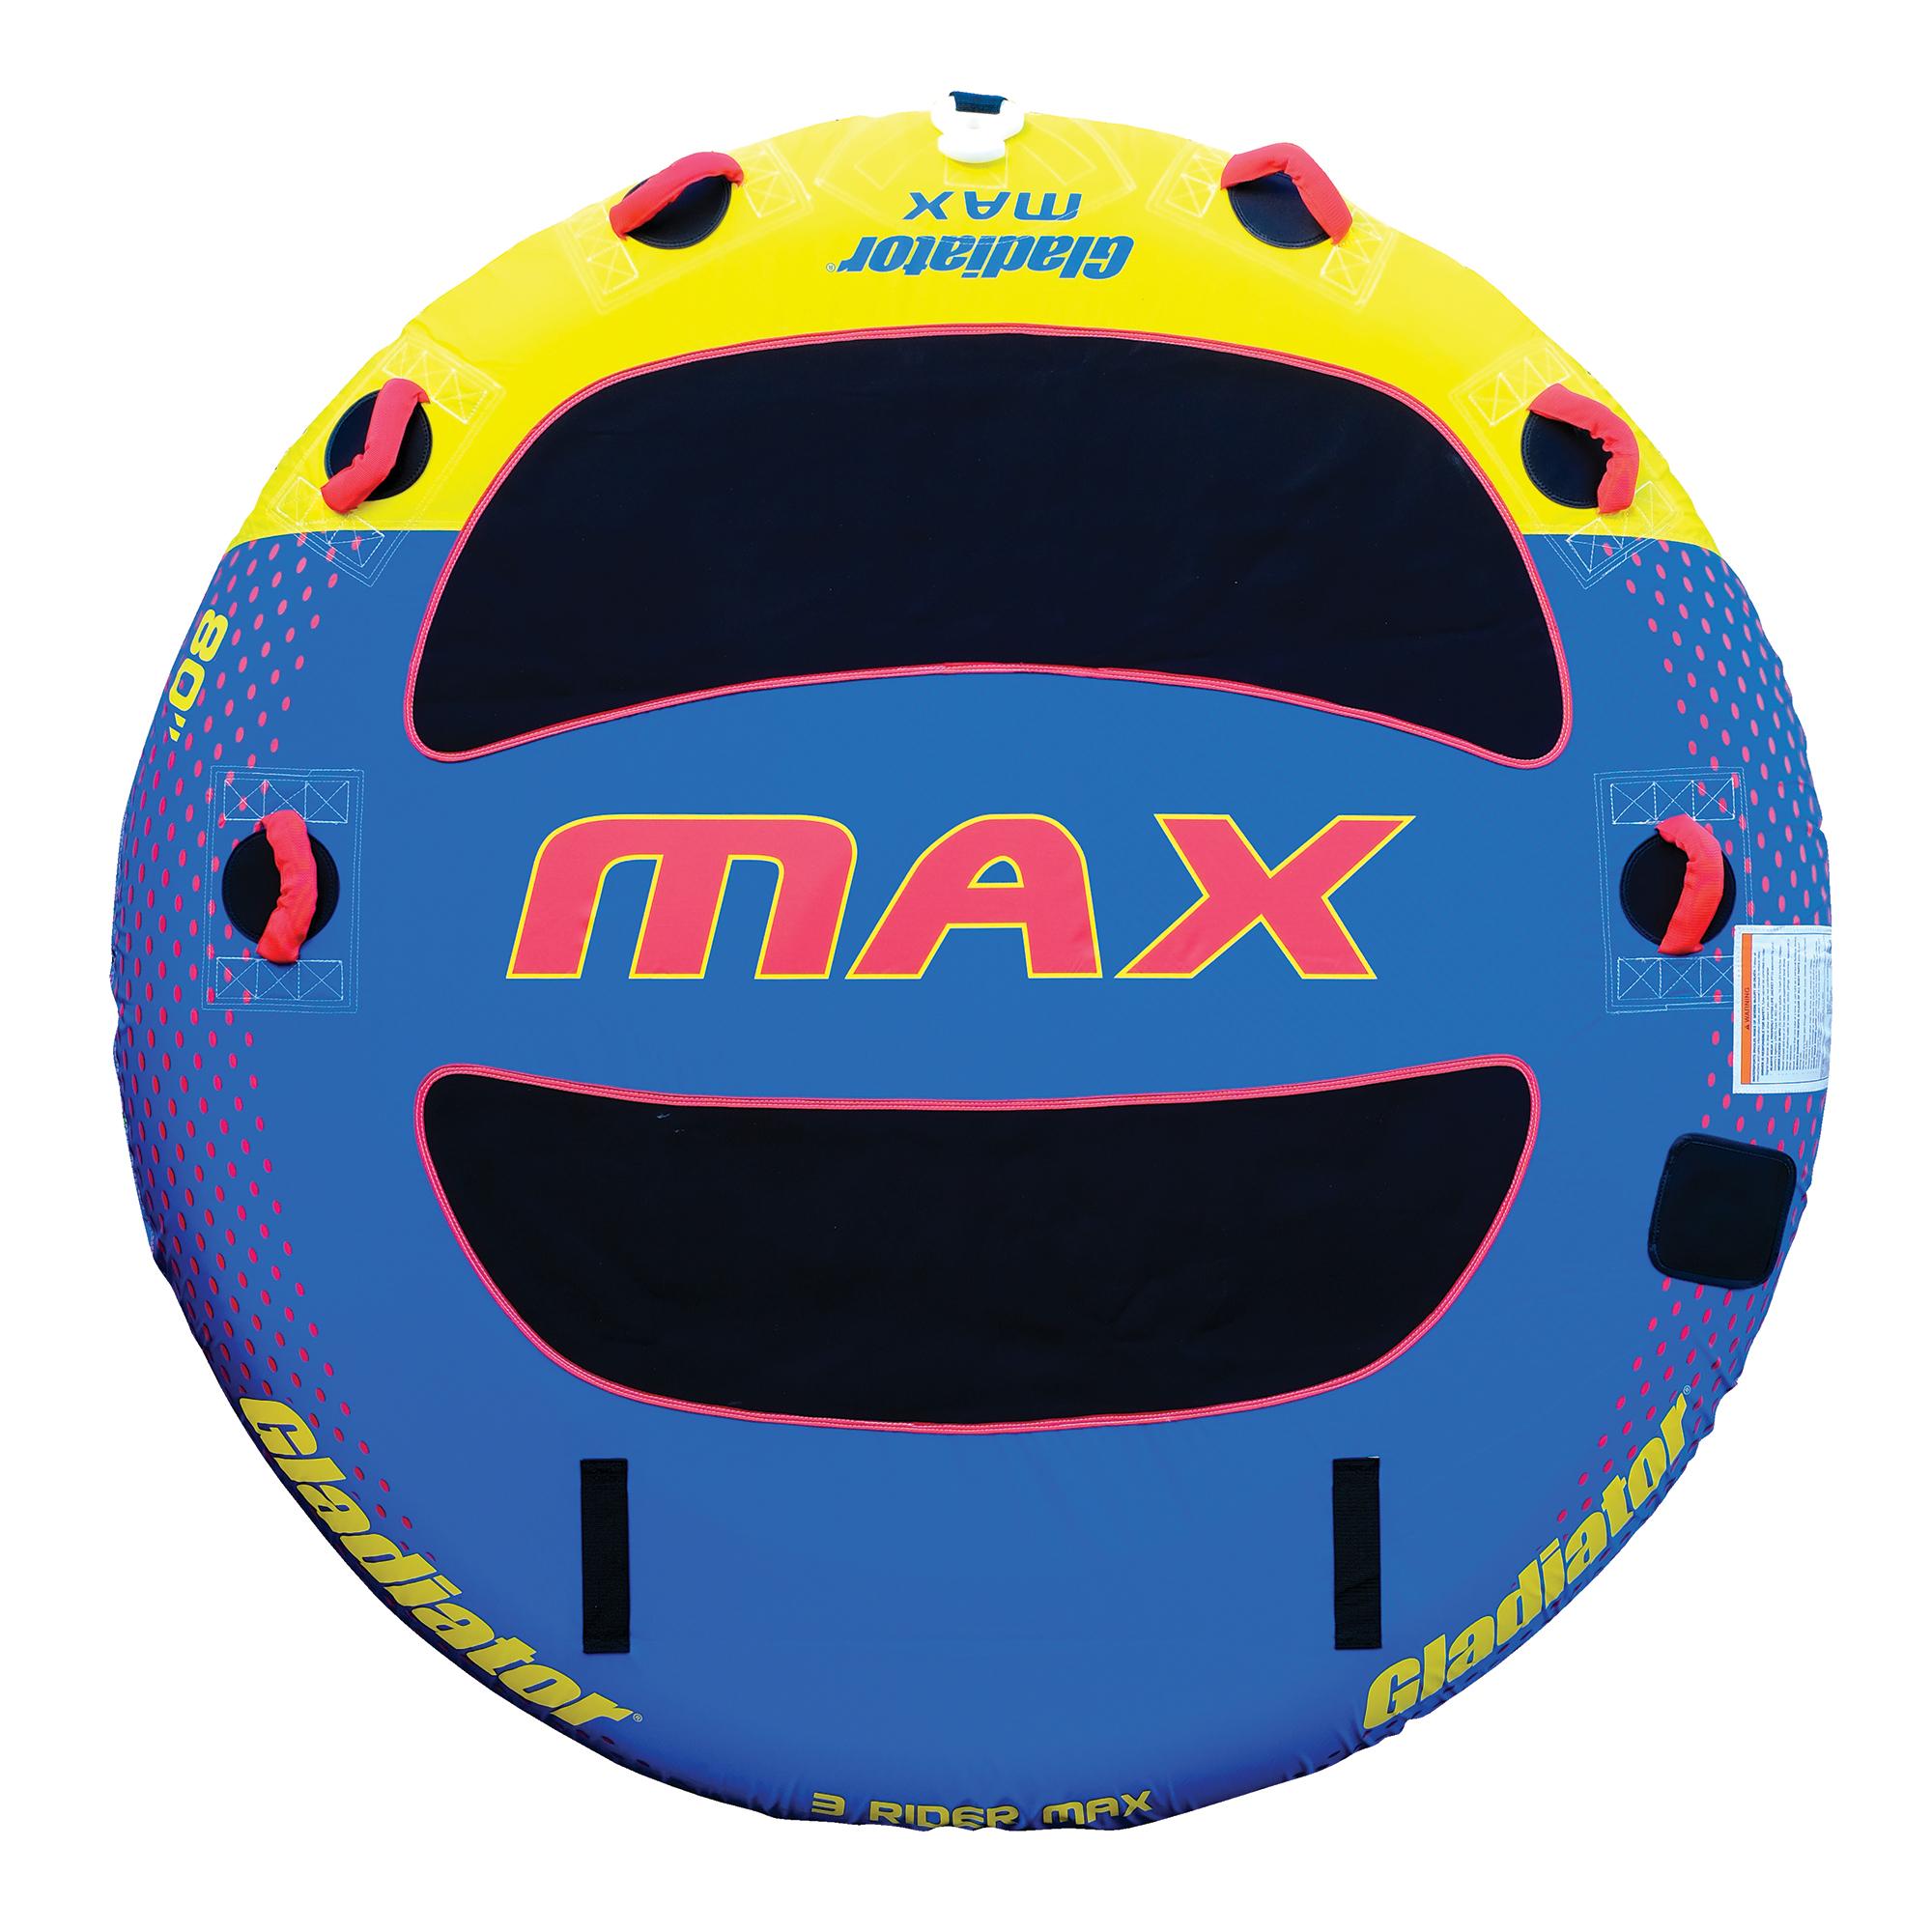 Gladiator Max Deck Rider 3-Person Towable Tube